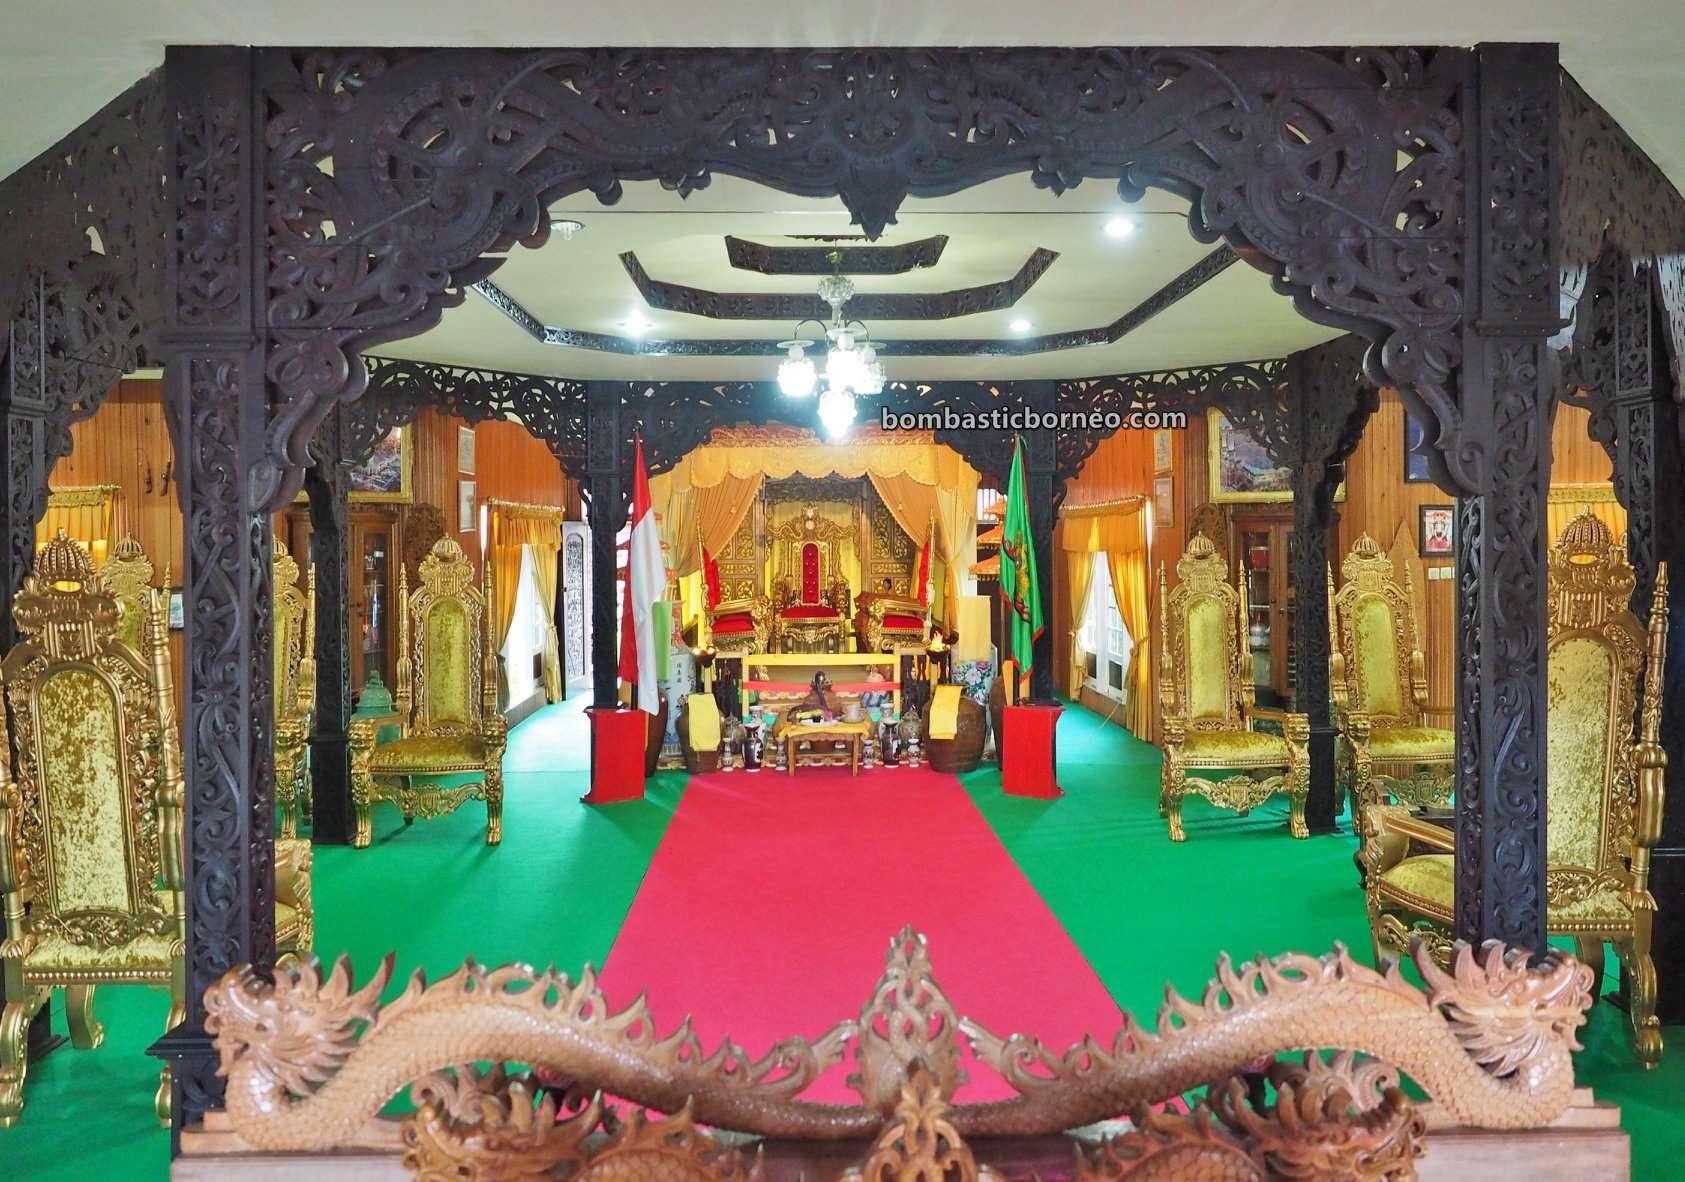 Rumah Baloy Mayo, Rumah Adat Tidung, Traditional House, Heritage Centre, culture, authentic, native, destination, Indonesia, North Kalimantan, Tarakan, wisata budaya, Tourism, travel guide, Borneo,